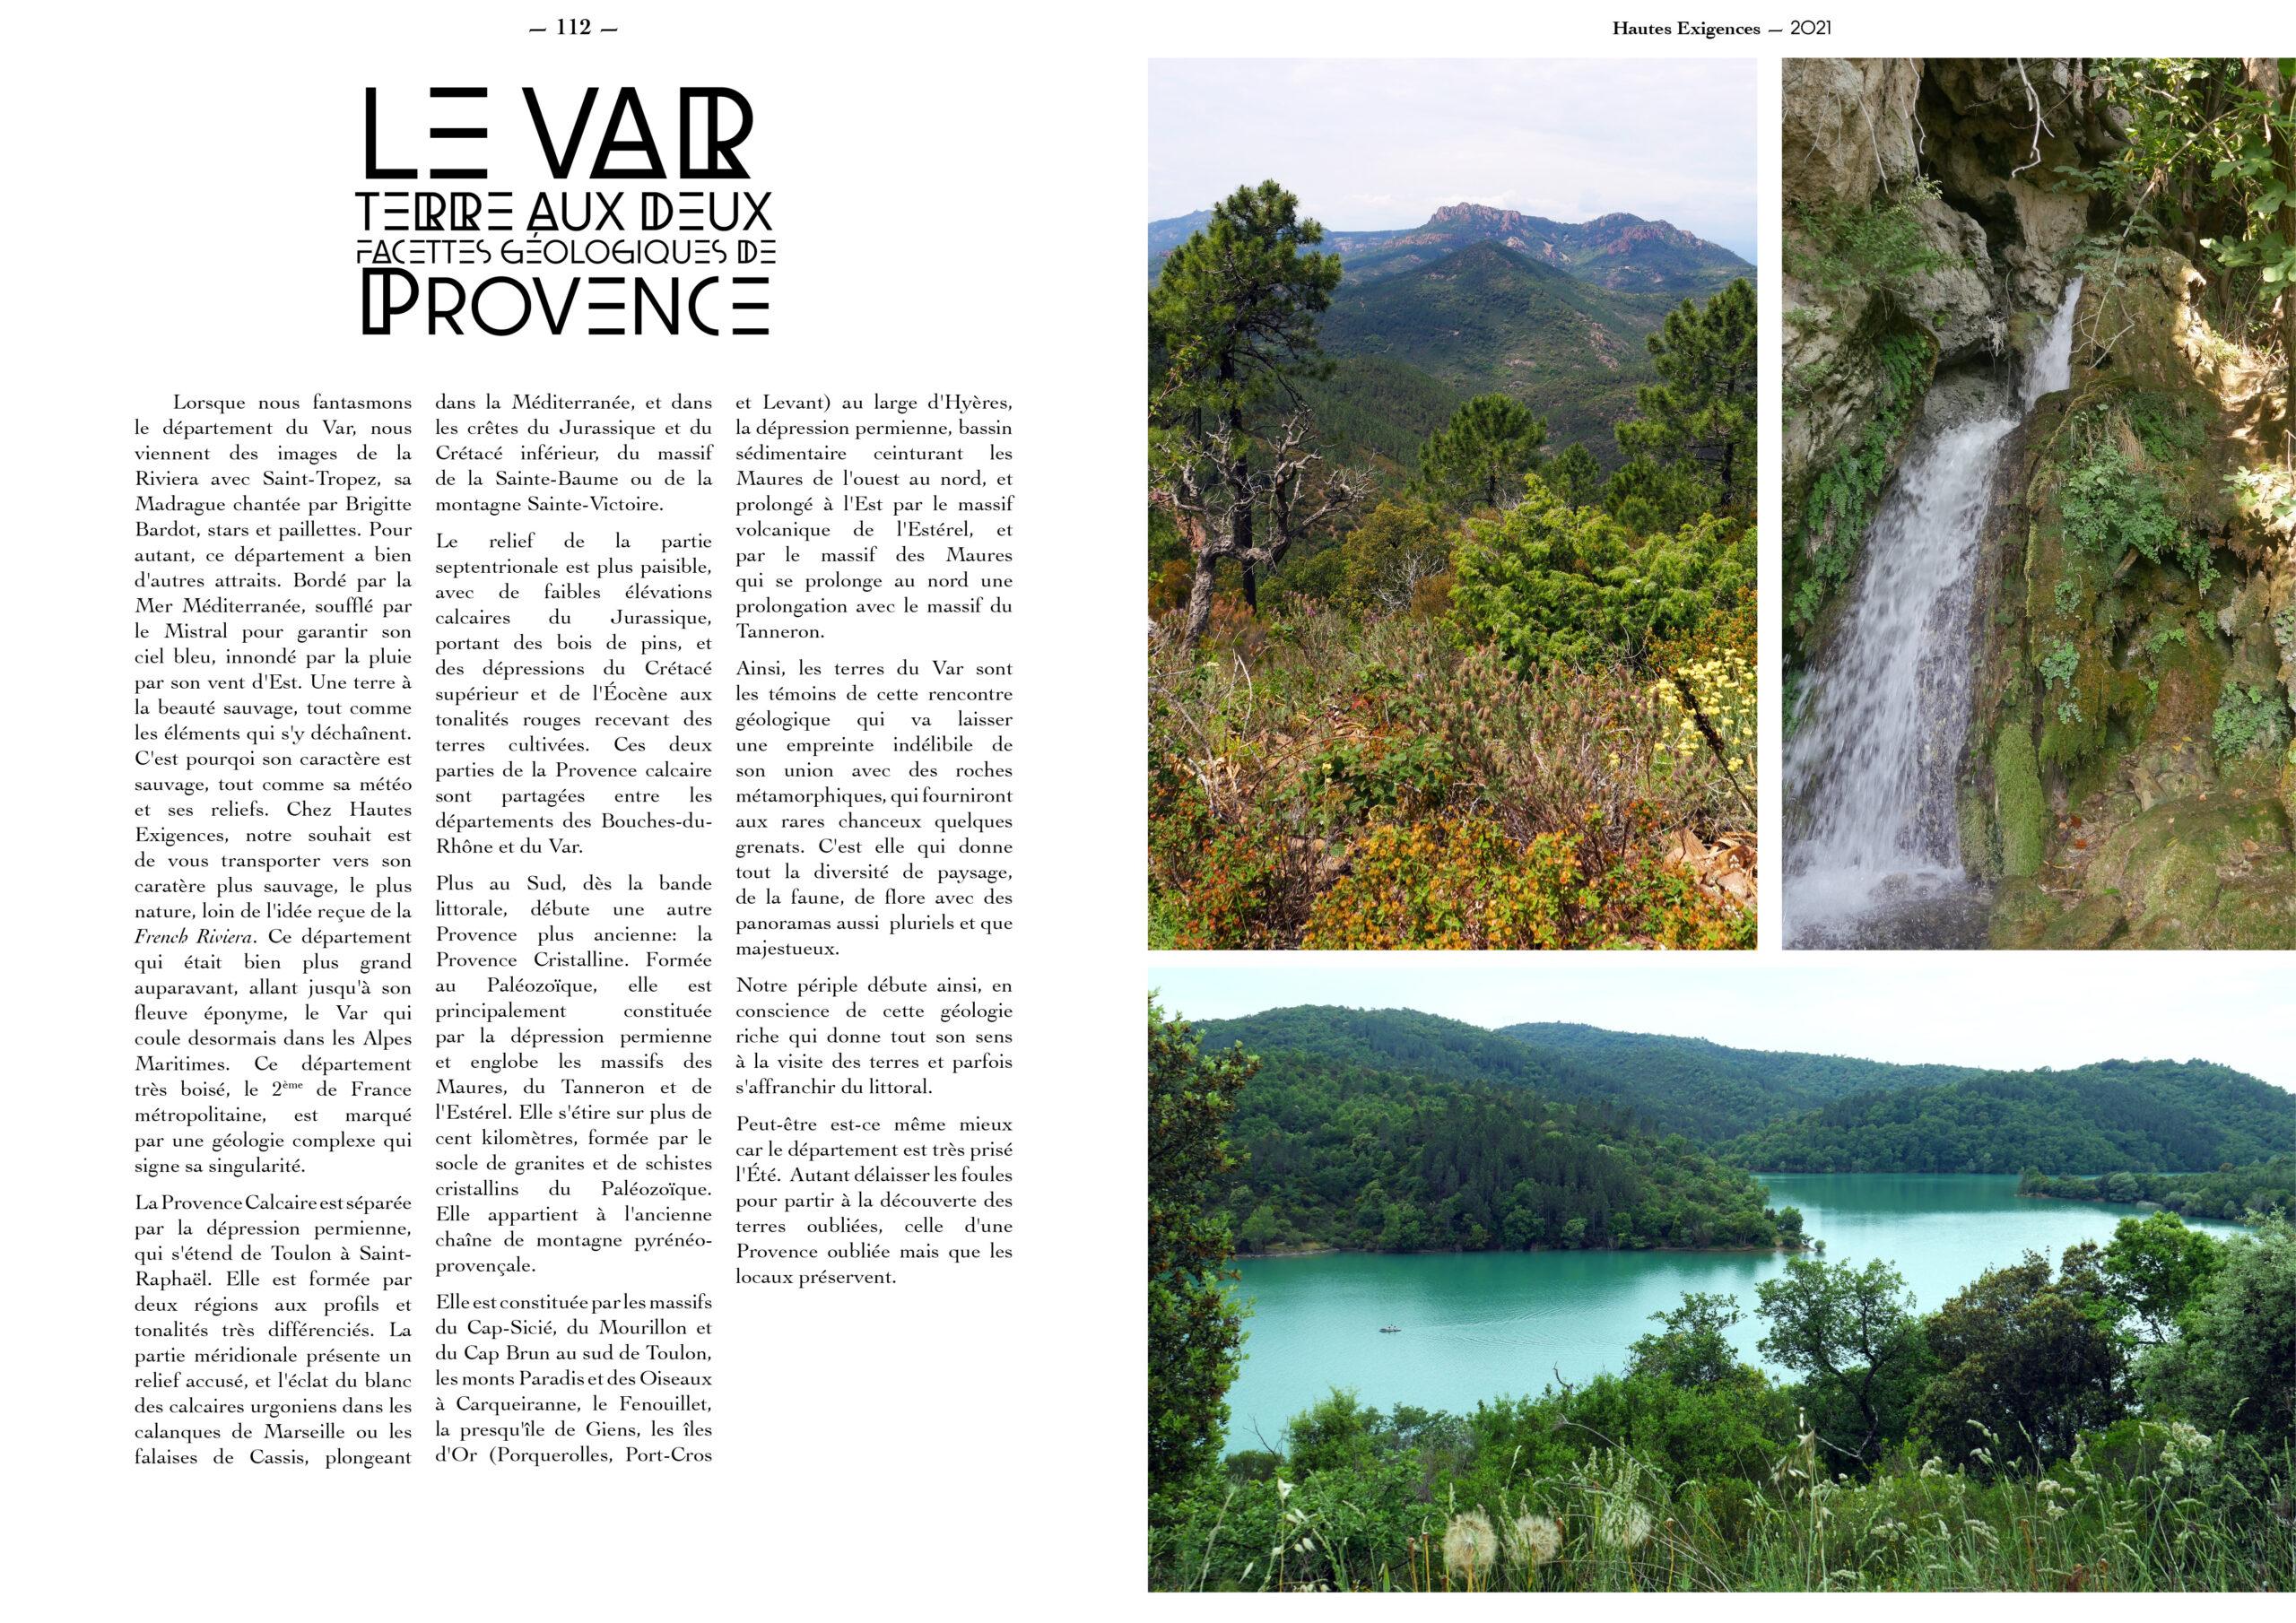 Hautes Exigences Magazine Hors Serie 2021 page 110-111